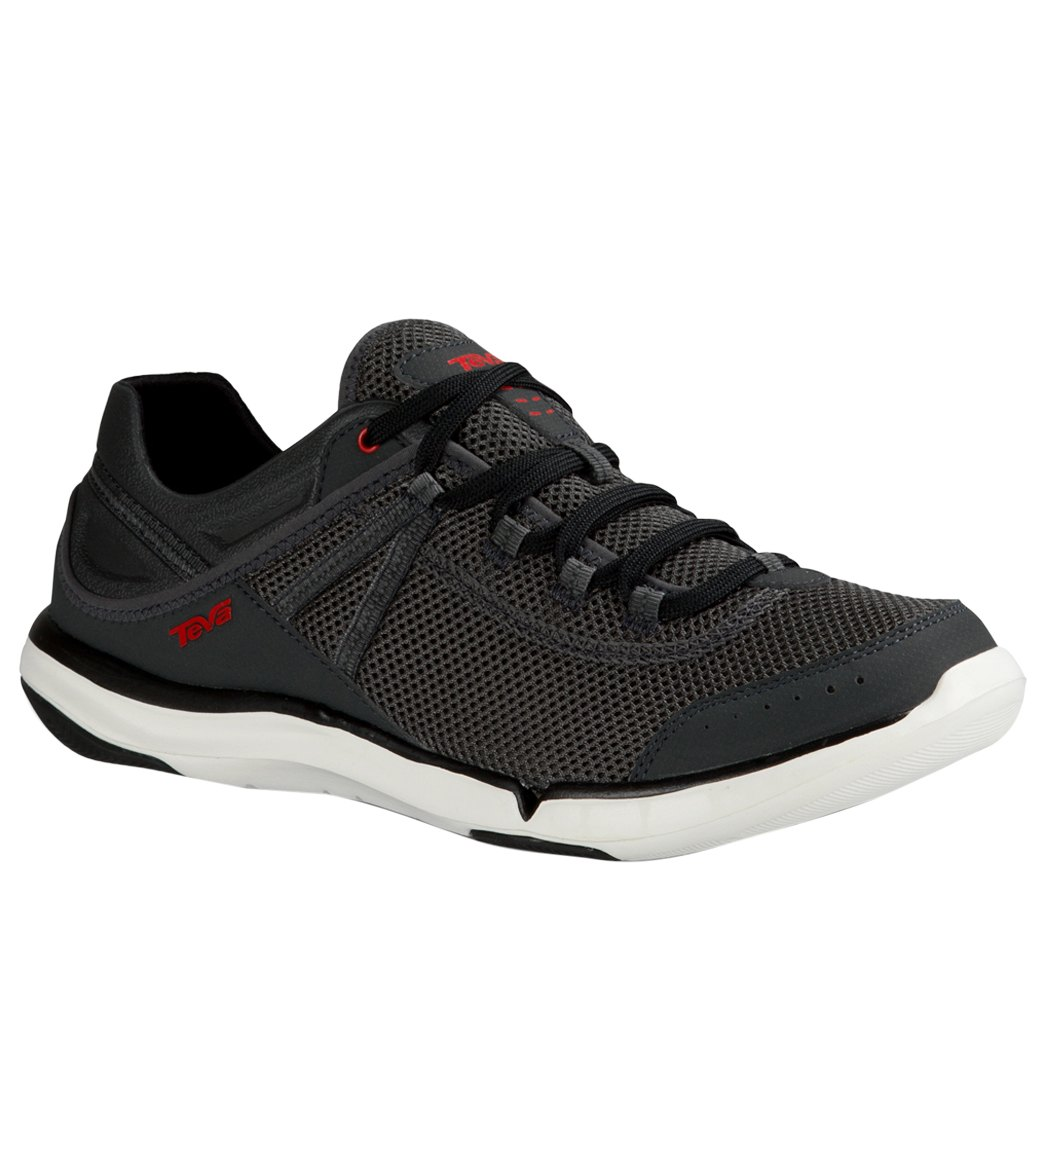 341e9b04ca1c Teva Men s Evo Water Shoe at SwimOutlet.com - Free Shipping